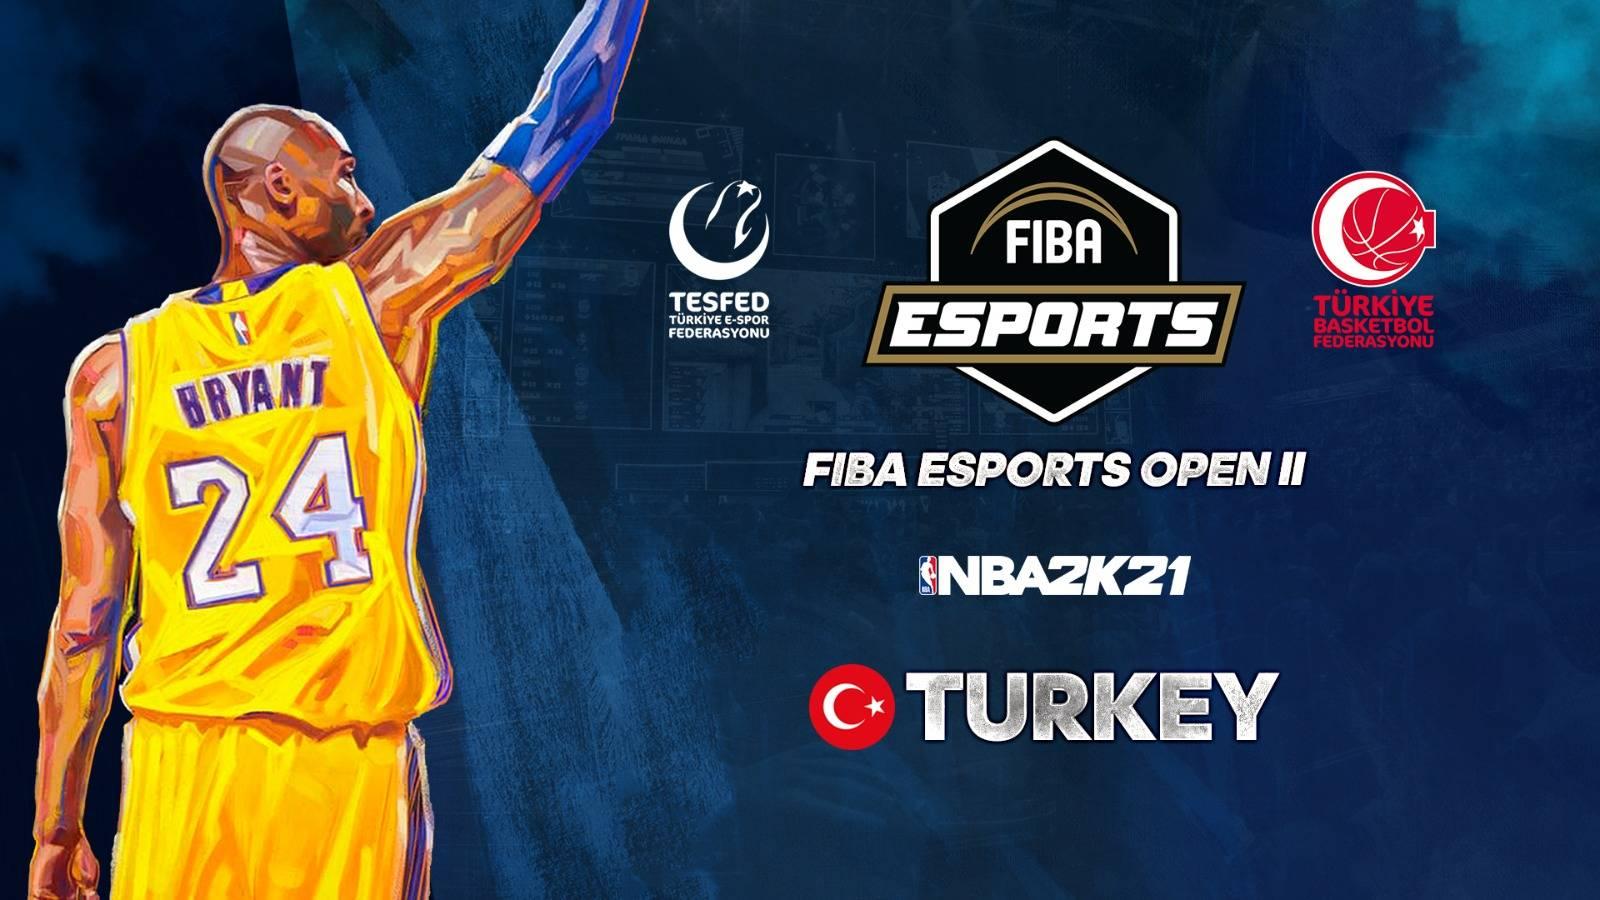 NBA2K-FIBA-Esports